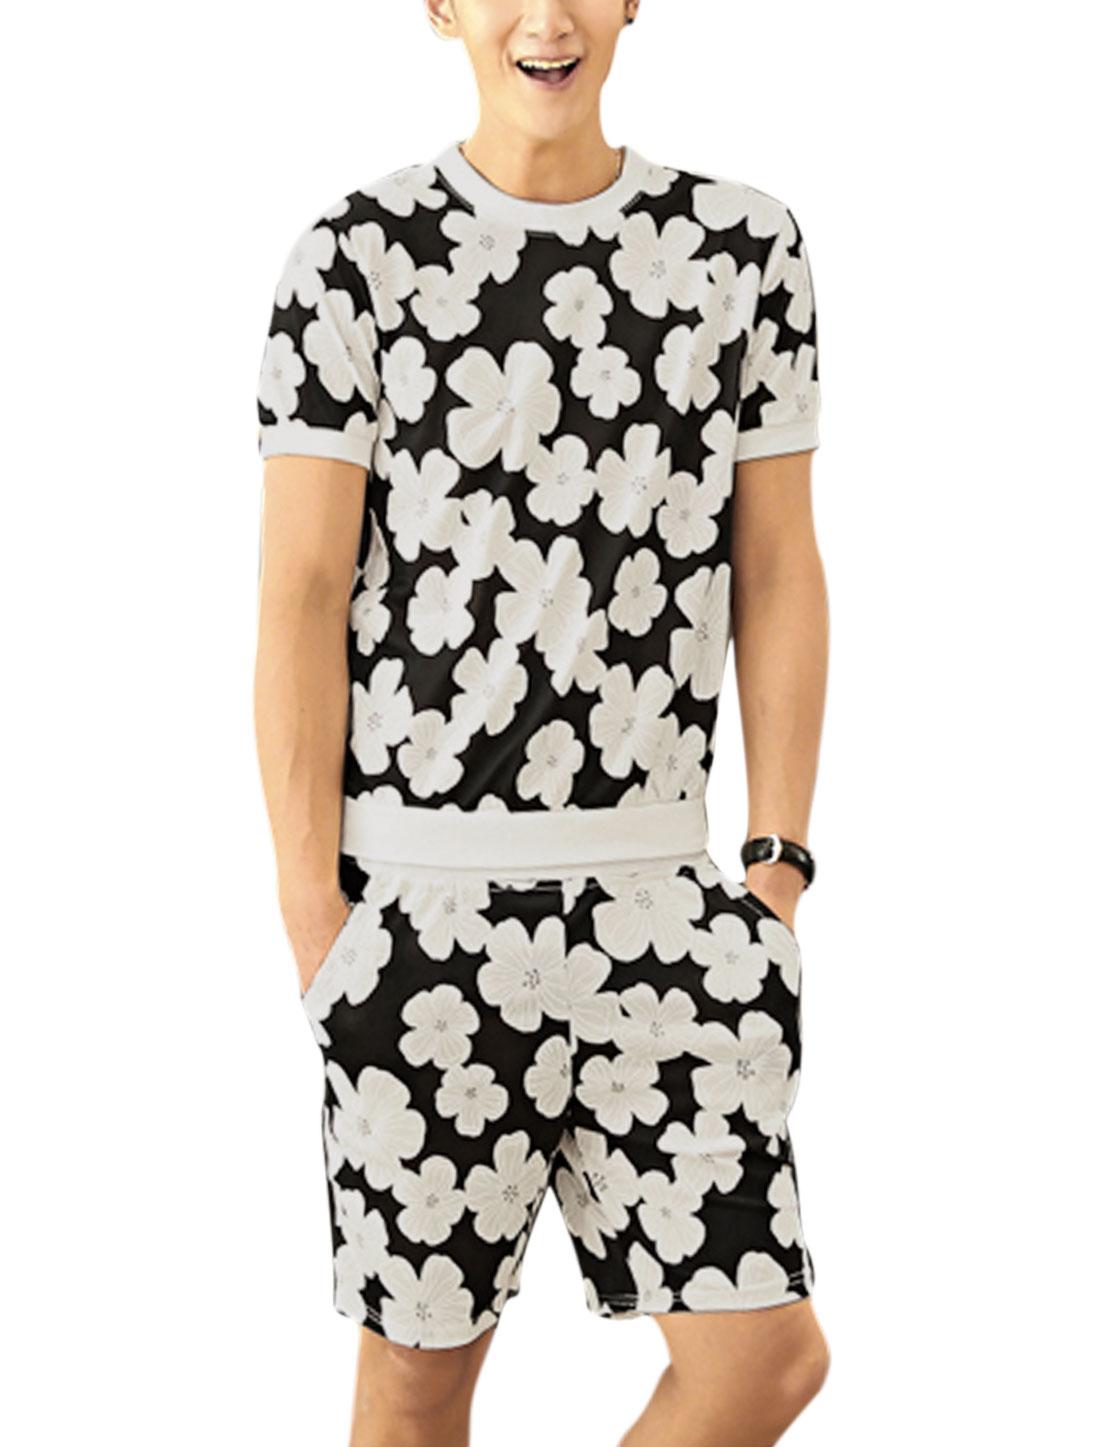 Men Floral Prints Short Sleeve T-Shirt w Elastic Waist Shorts Black White S